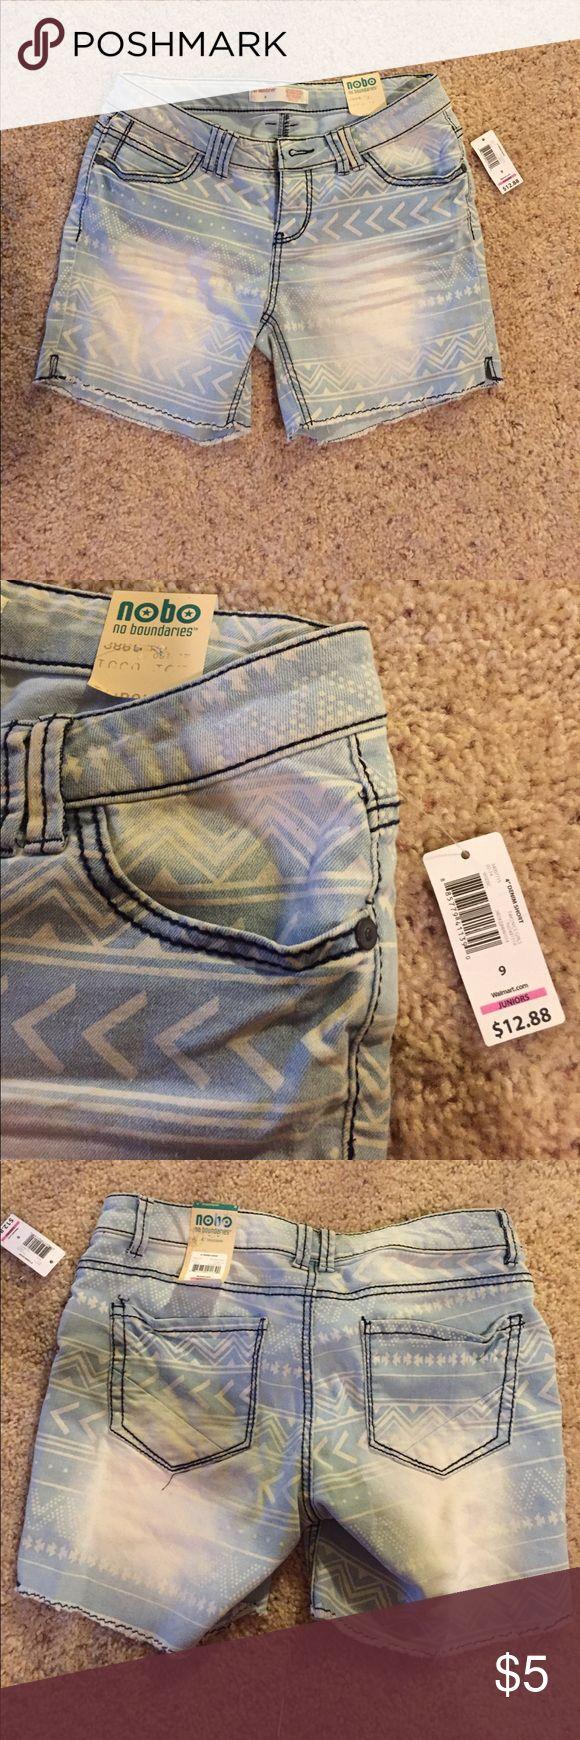 NWT Blue jean shorts Size 9 No Boundaries light blue jean shorts with tags. No Boundaries Shorts Jean Shorts